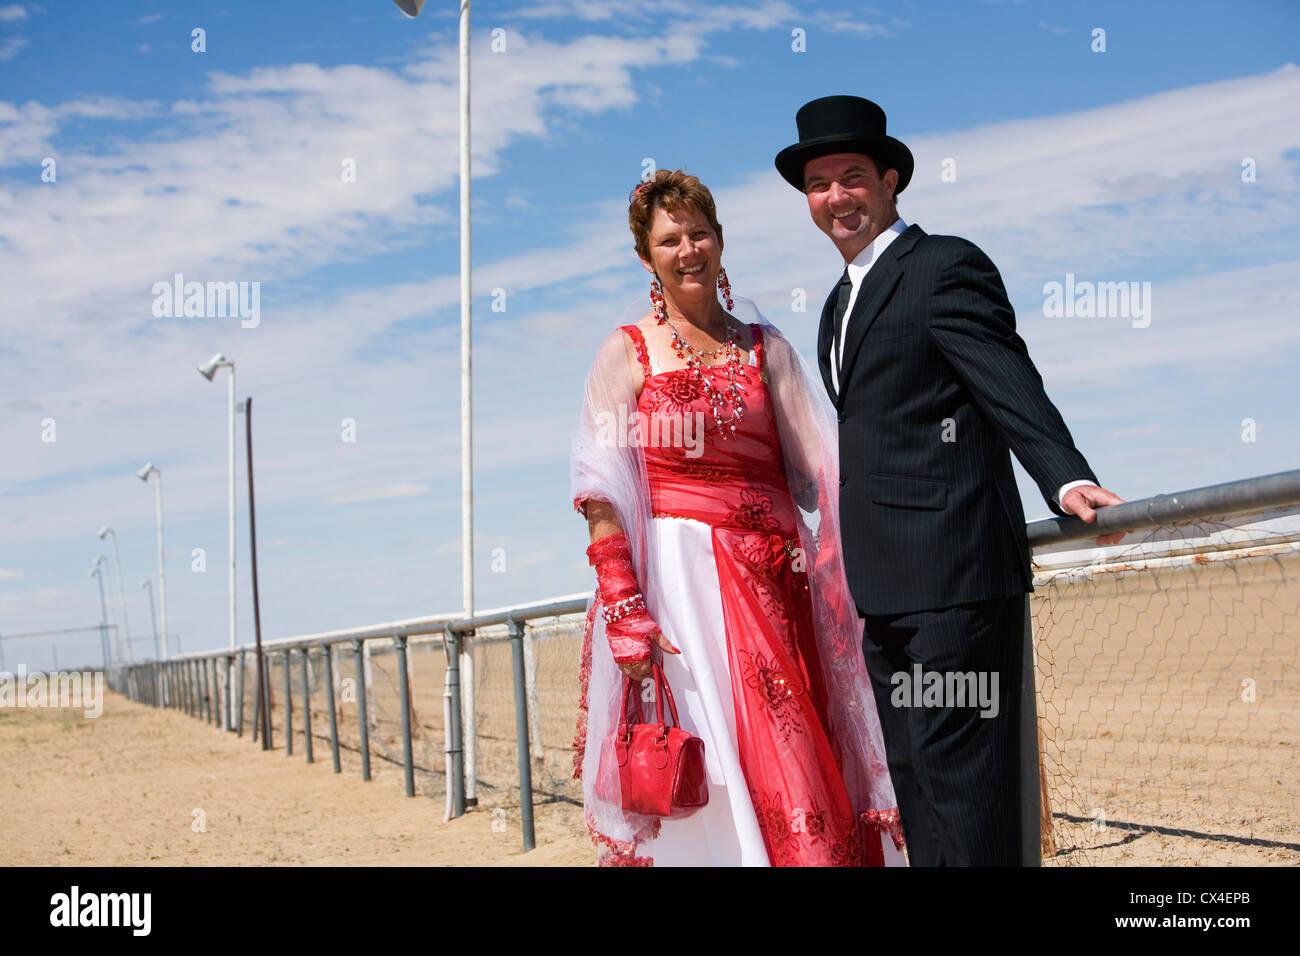 Couple in fancy dress for the fun of the Birdsville Races.  Birdsville, Queensland, AUSTRALIA. - Stock Image